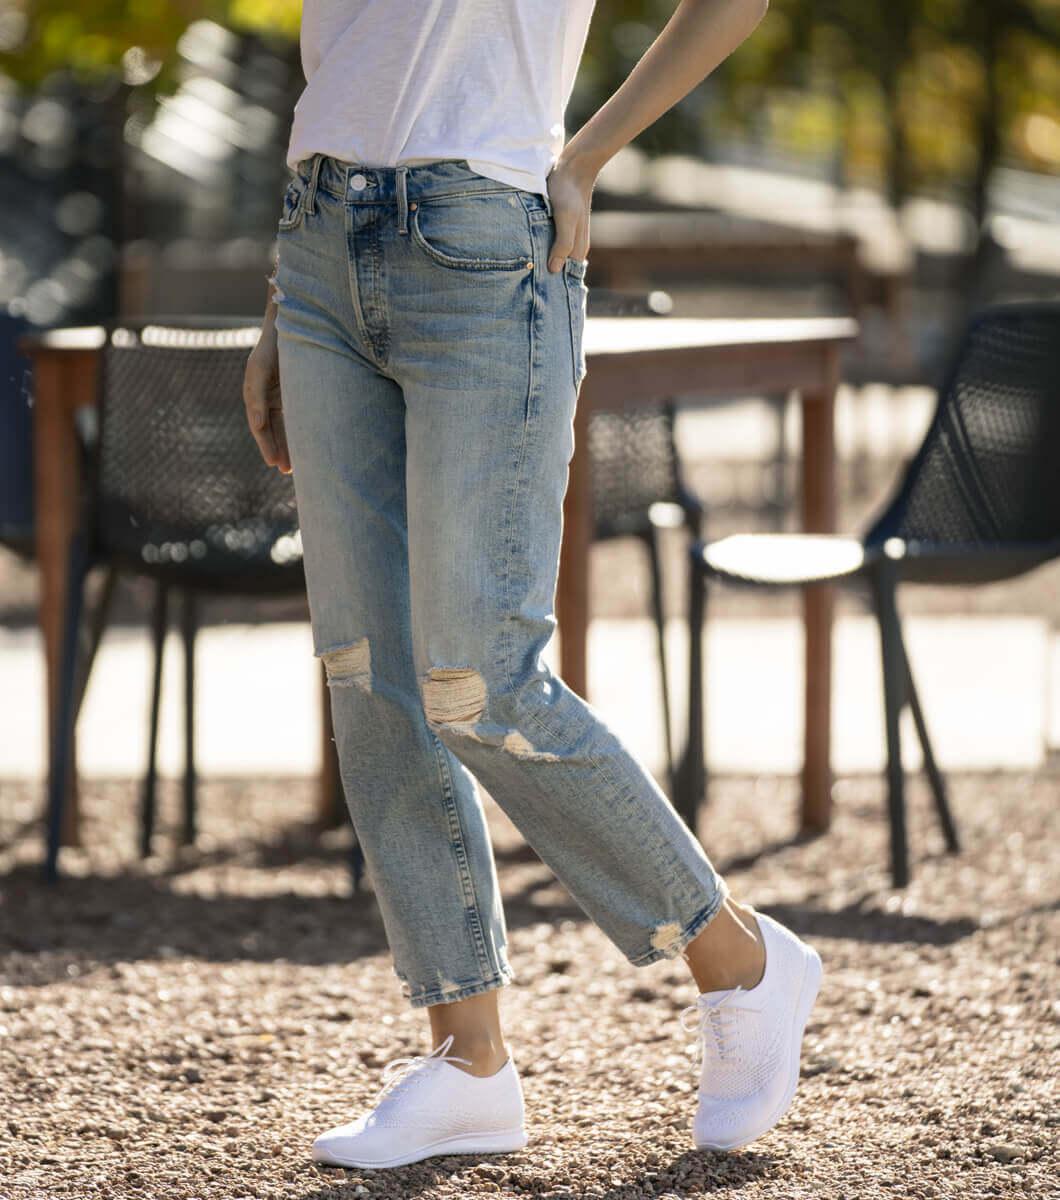 thumbnail 28 - Brand New Women's Florsheim Nina Sneakers